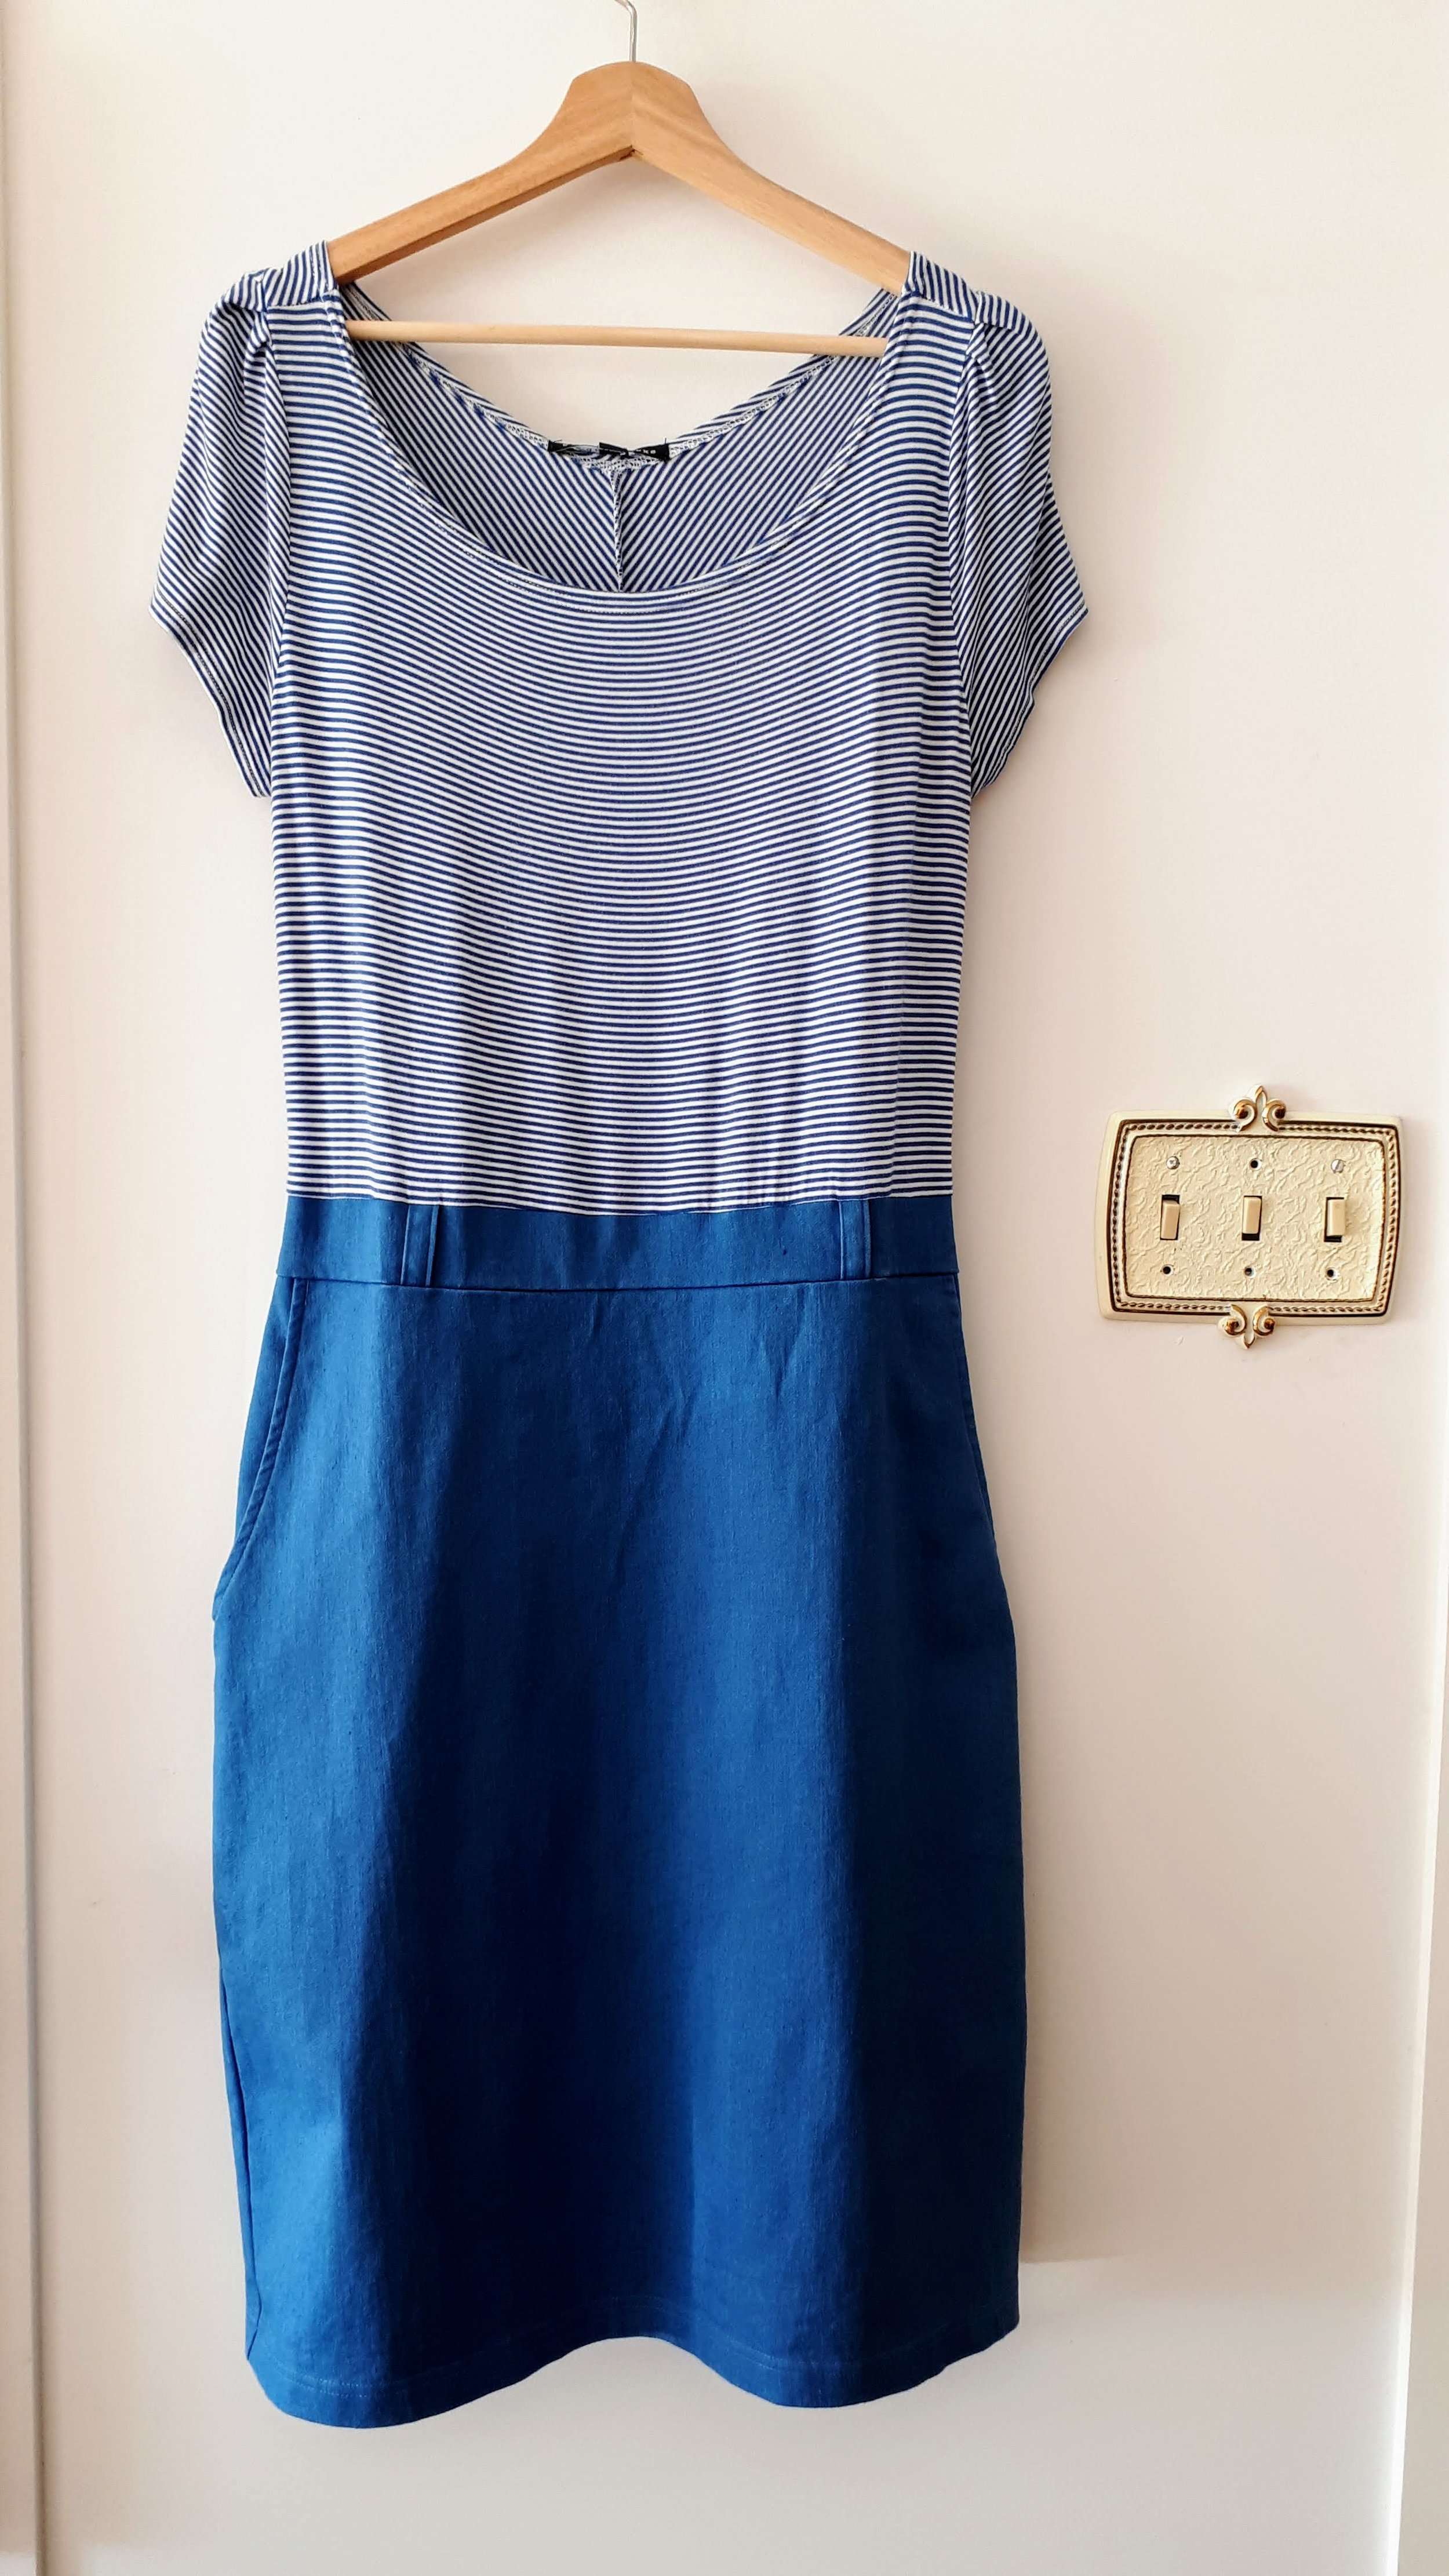 Cinder & Smoke dress; Size 12, $45